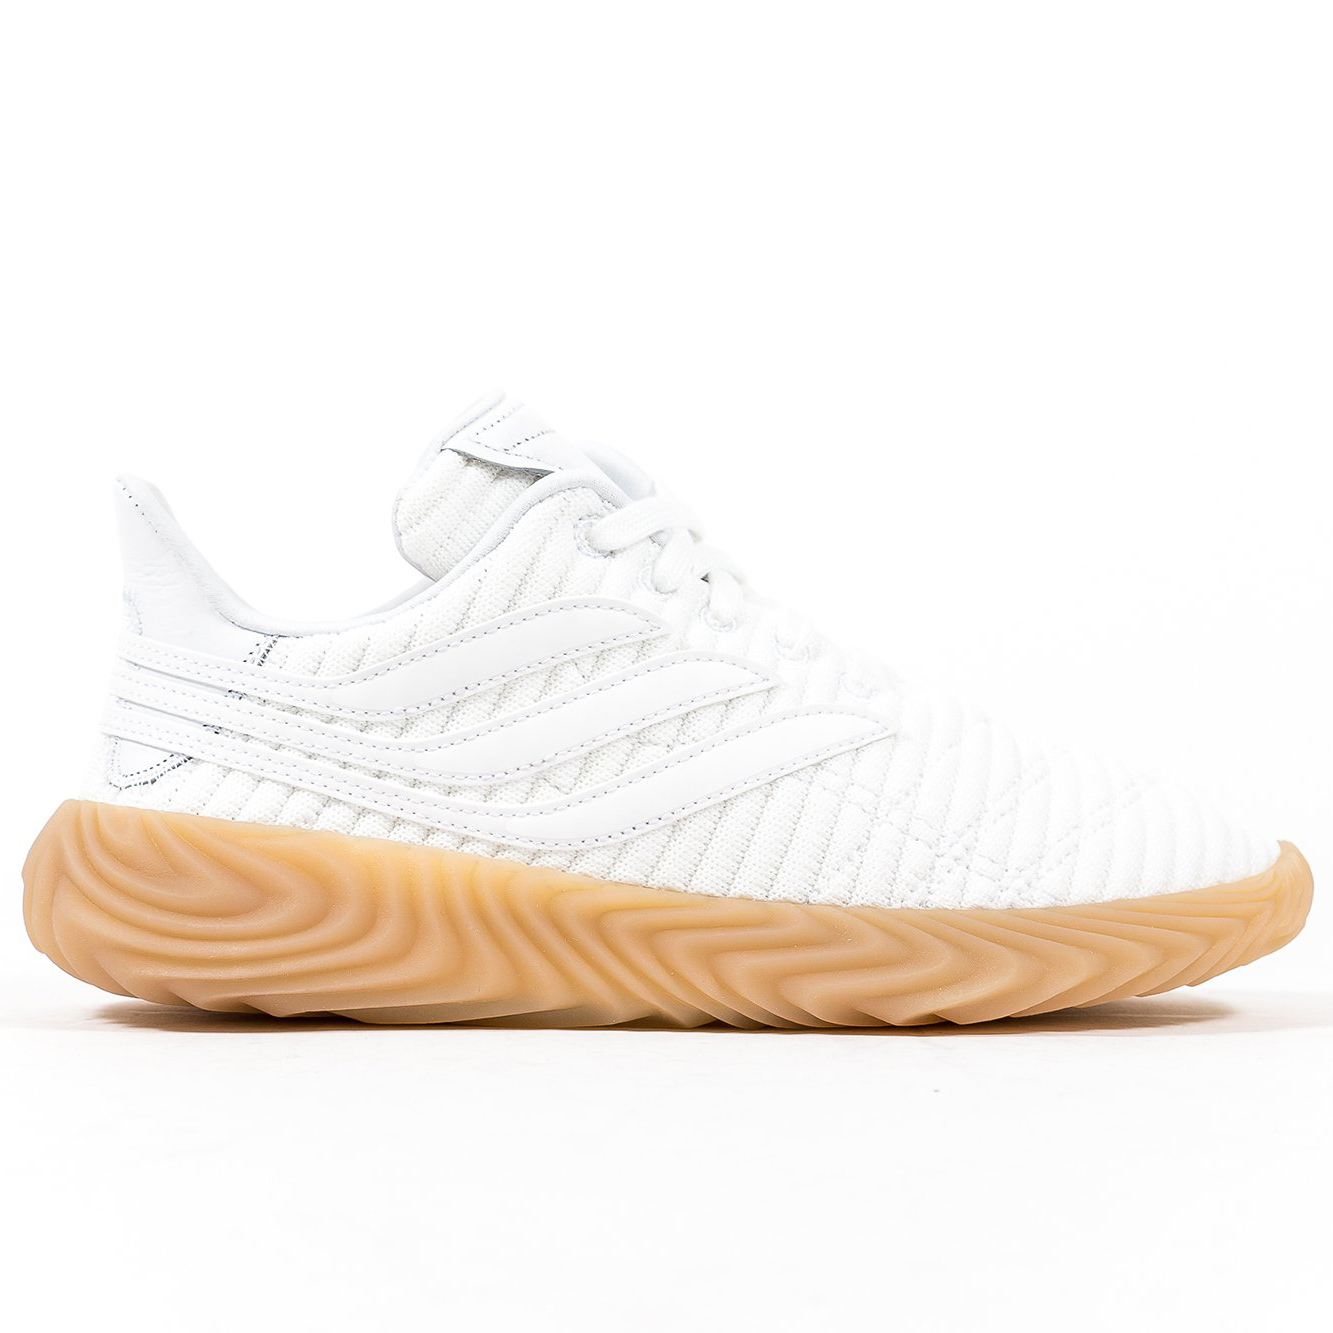 cb061c62511 Adidas Sobakov (Triple White  White  Gum) and 38 similar items